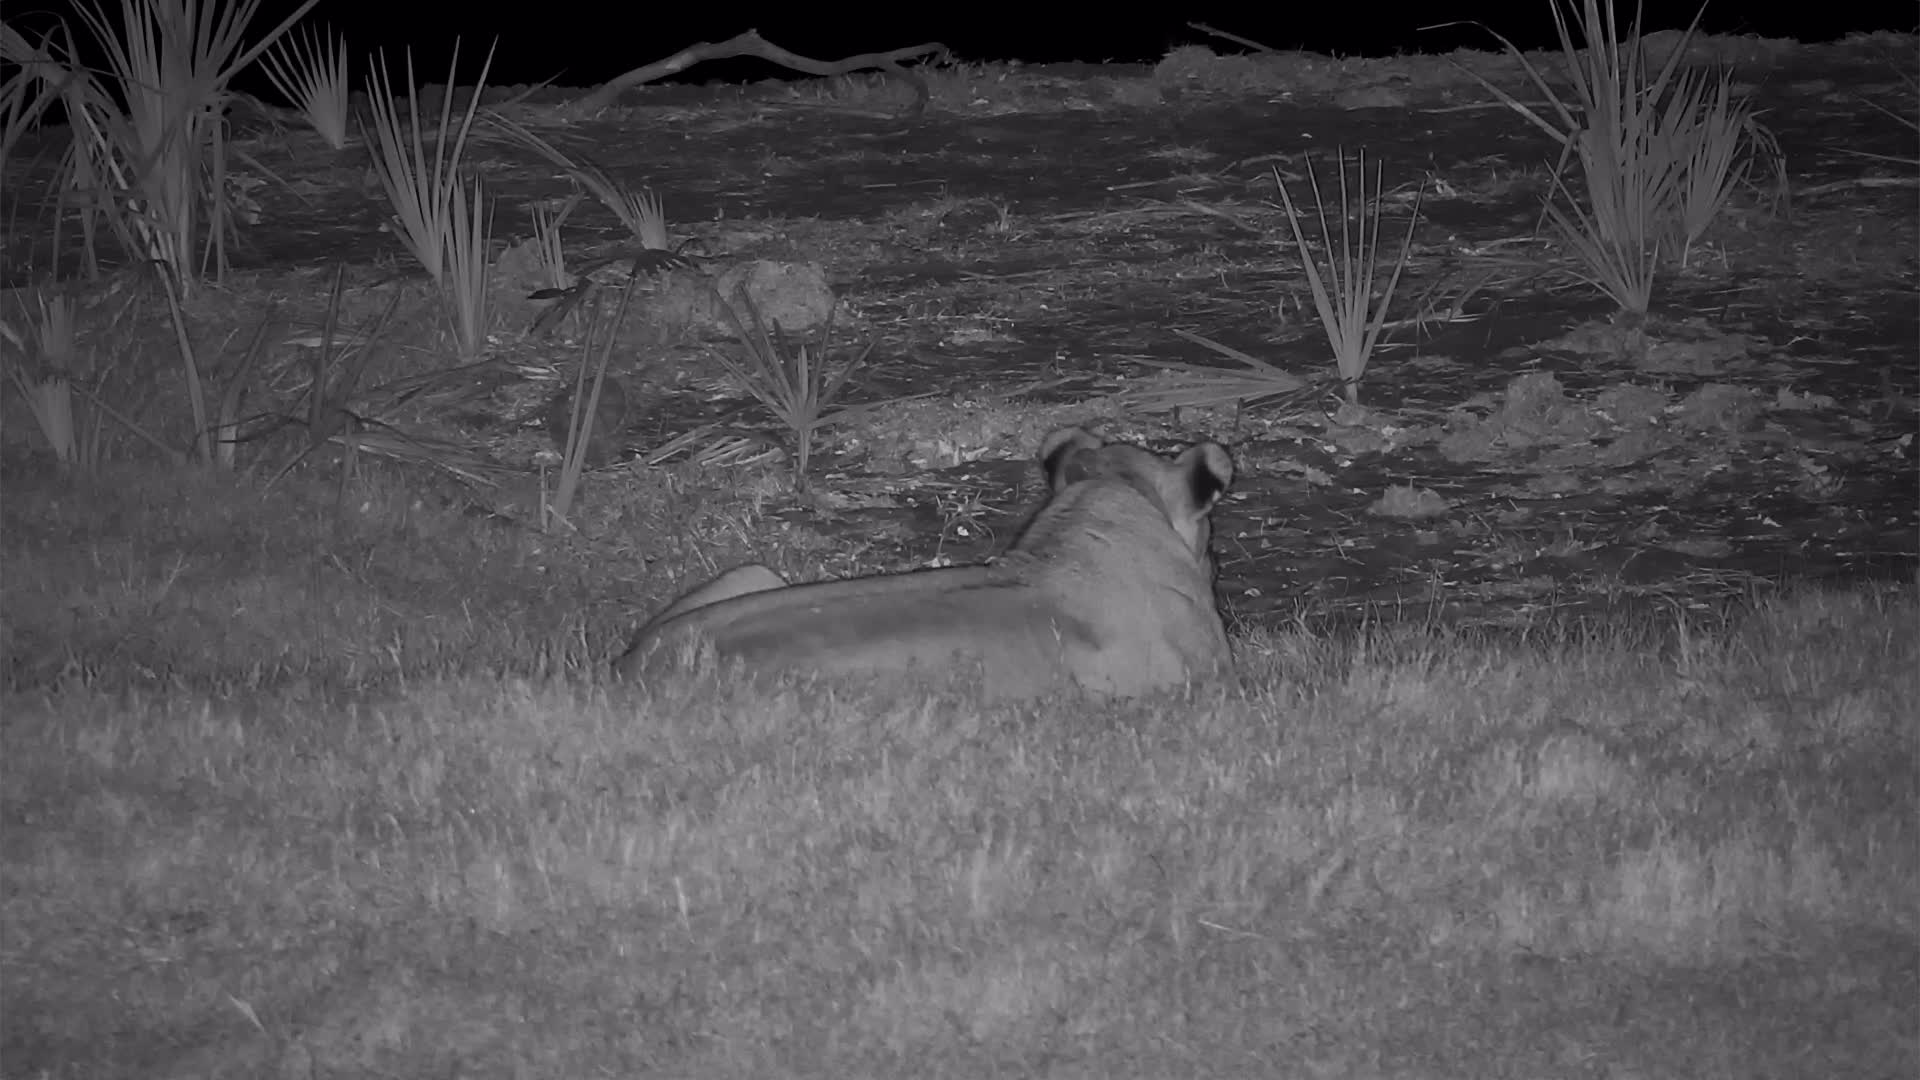 VIDEO: Lion at the waterhole roaring